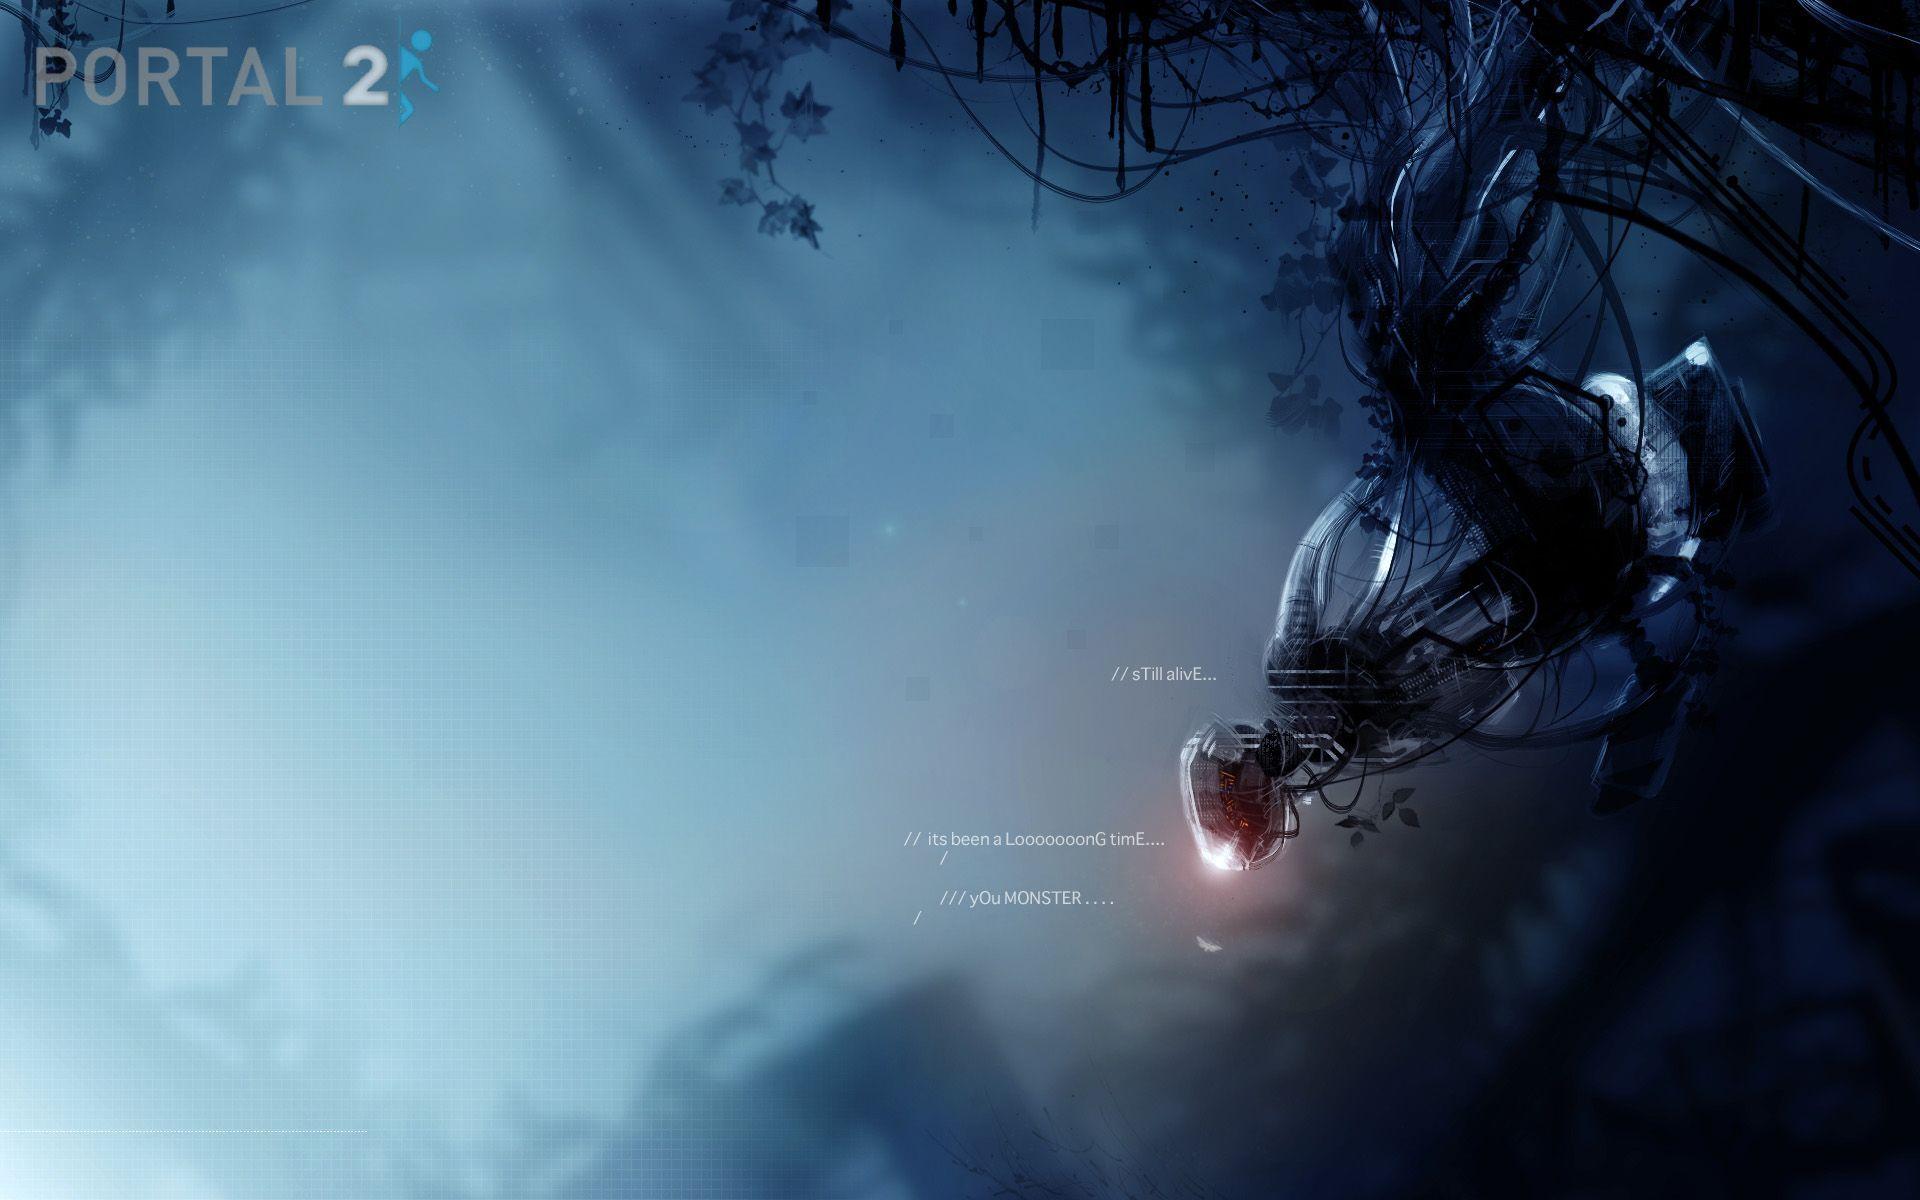 Portal 2 Desktop Wallpapers on WallpaperDog